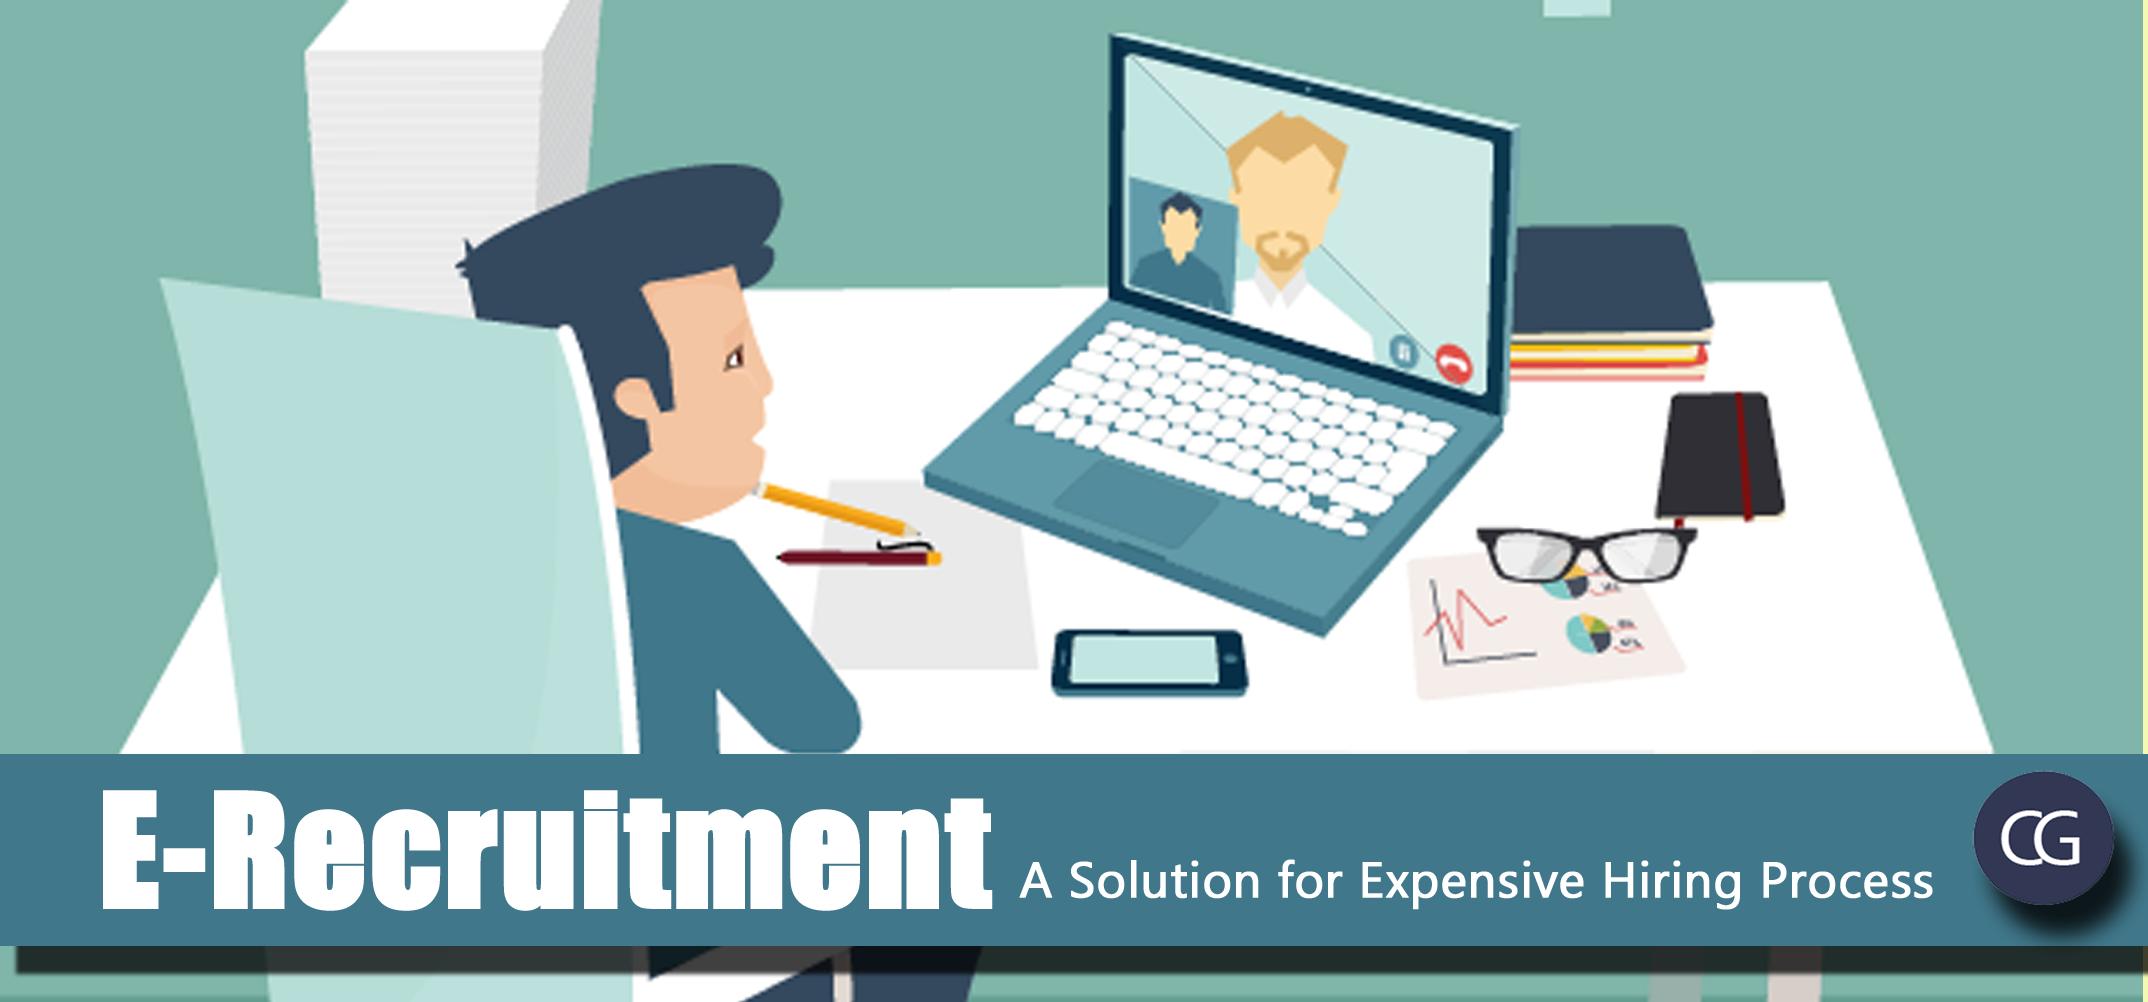 E-Recruitment: A Solution for Expensive Hiring Process